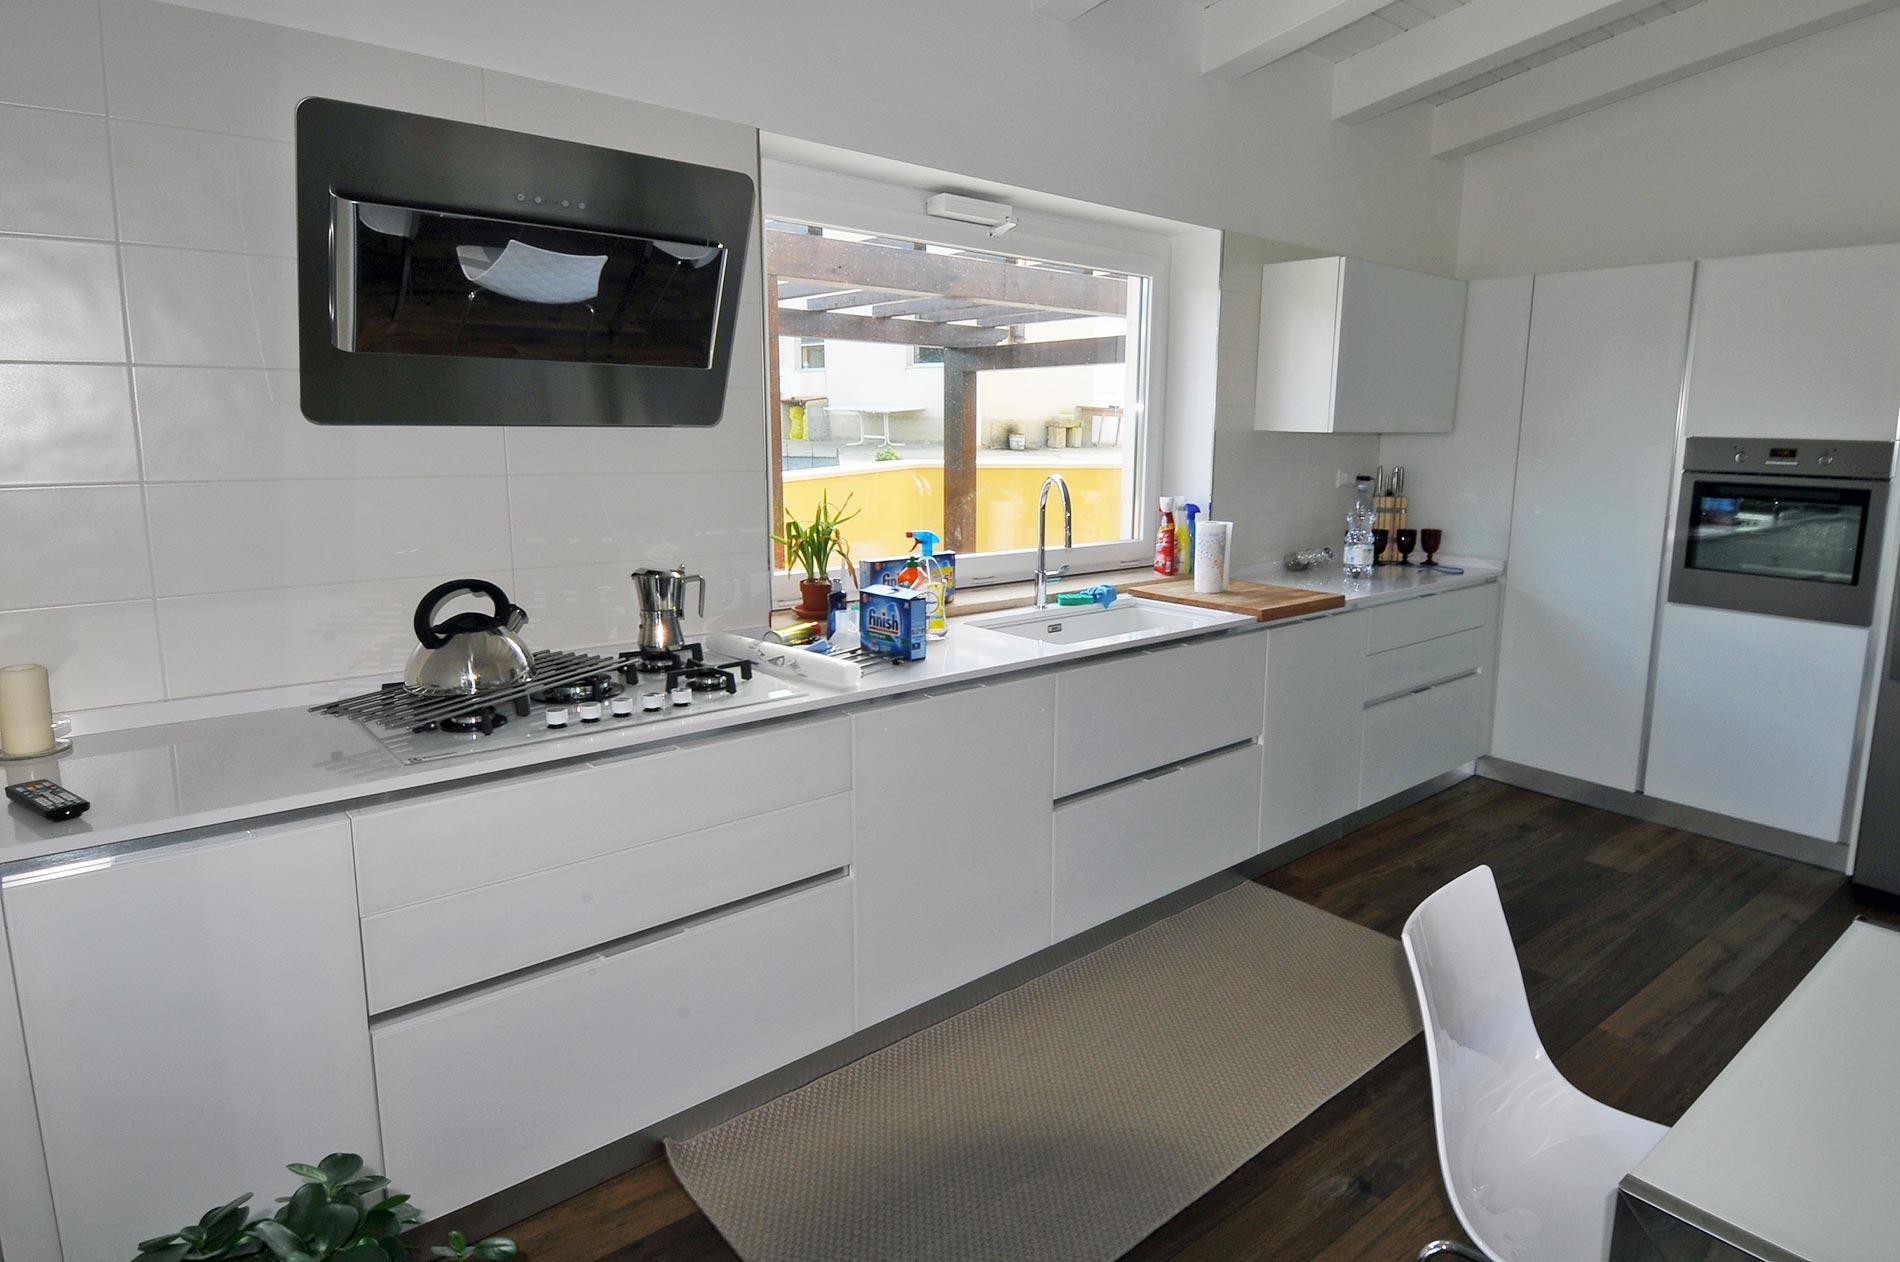 Best cucine eleganti moderne pictures ideas design - Chiara blogger cucina ...